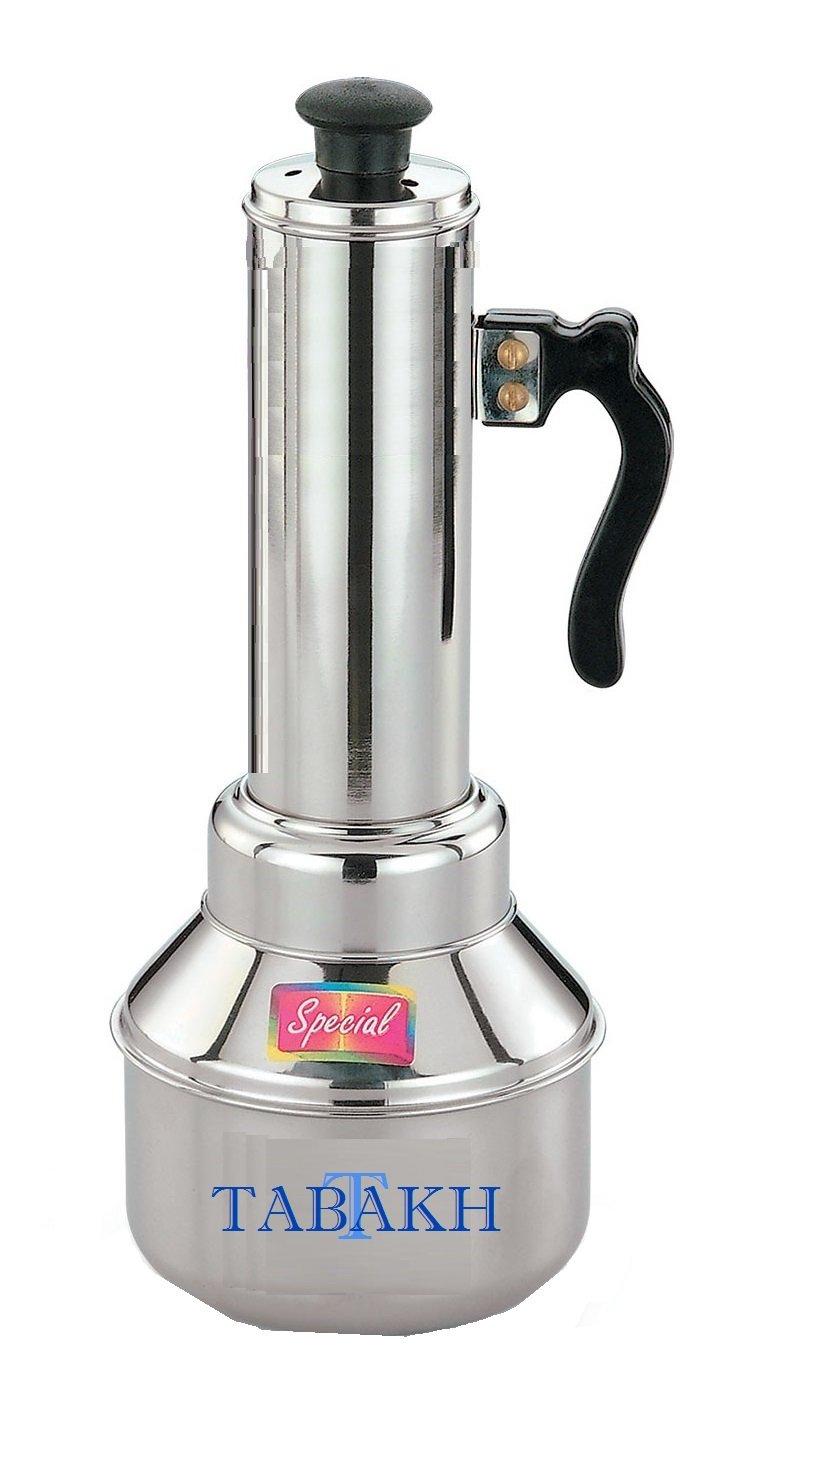 Tabakh Micro Puttu Kudam Cooker Stainless Steel Steamer, 0.5 Liter